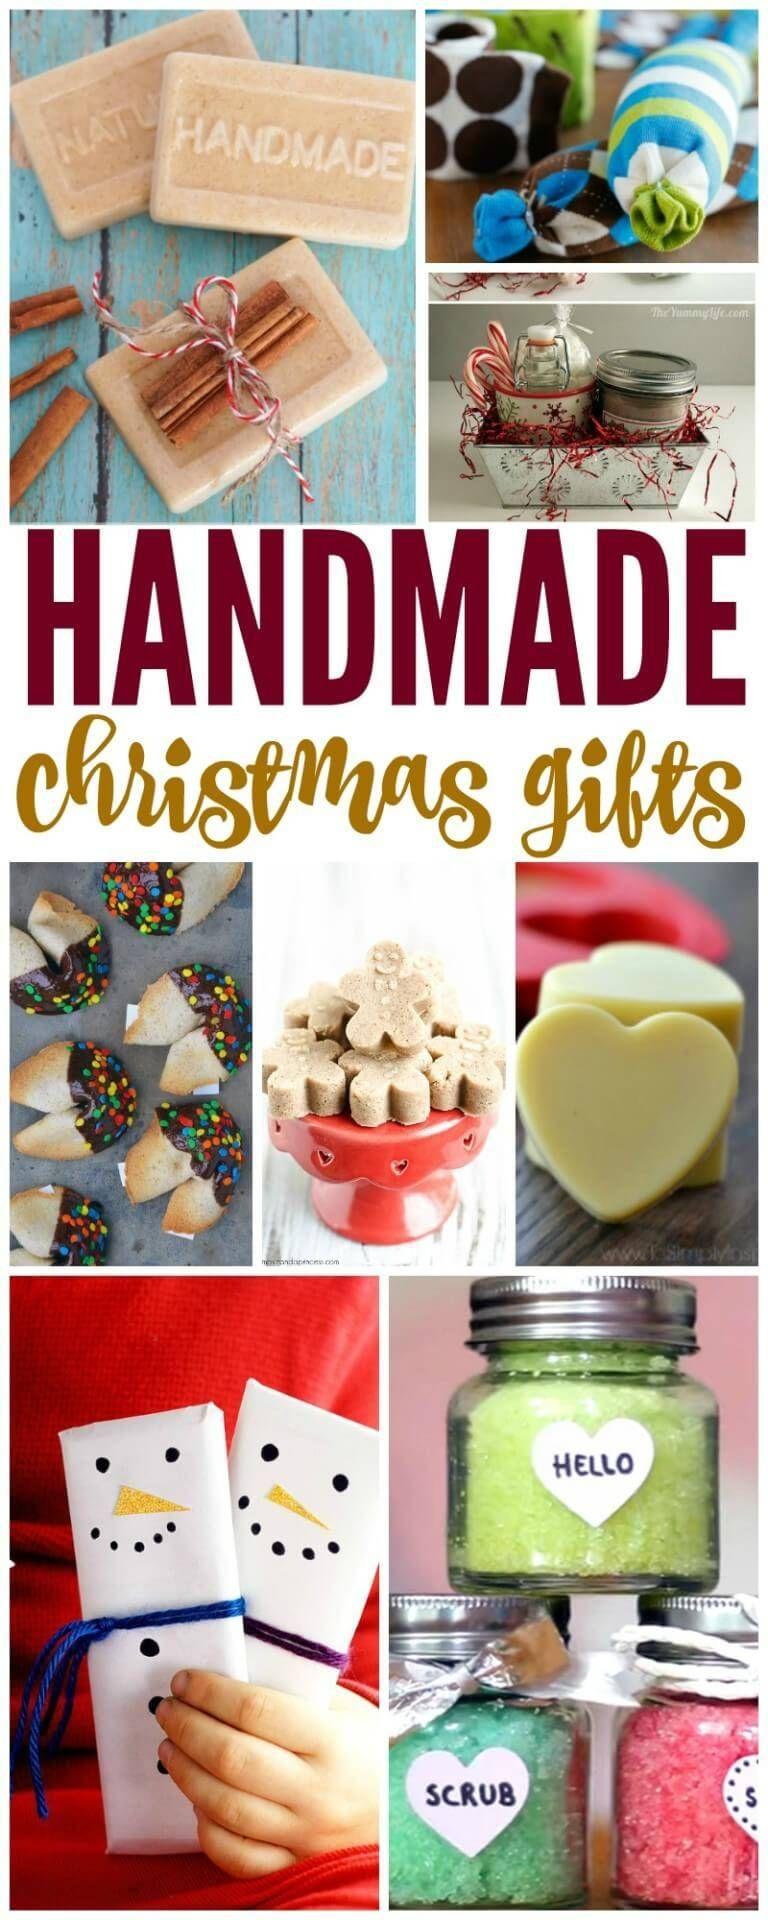 Diy Christmas Gifts Pinterest.Z Handmade Christmas Gifts Pinterest Gifts Homemade